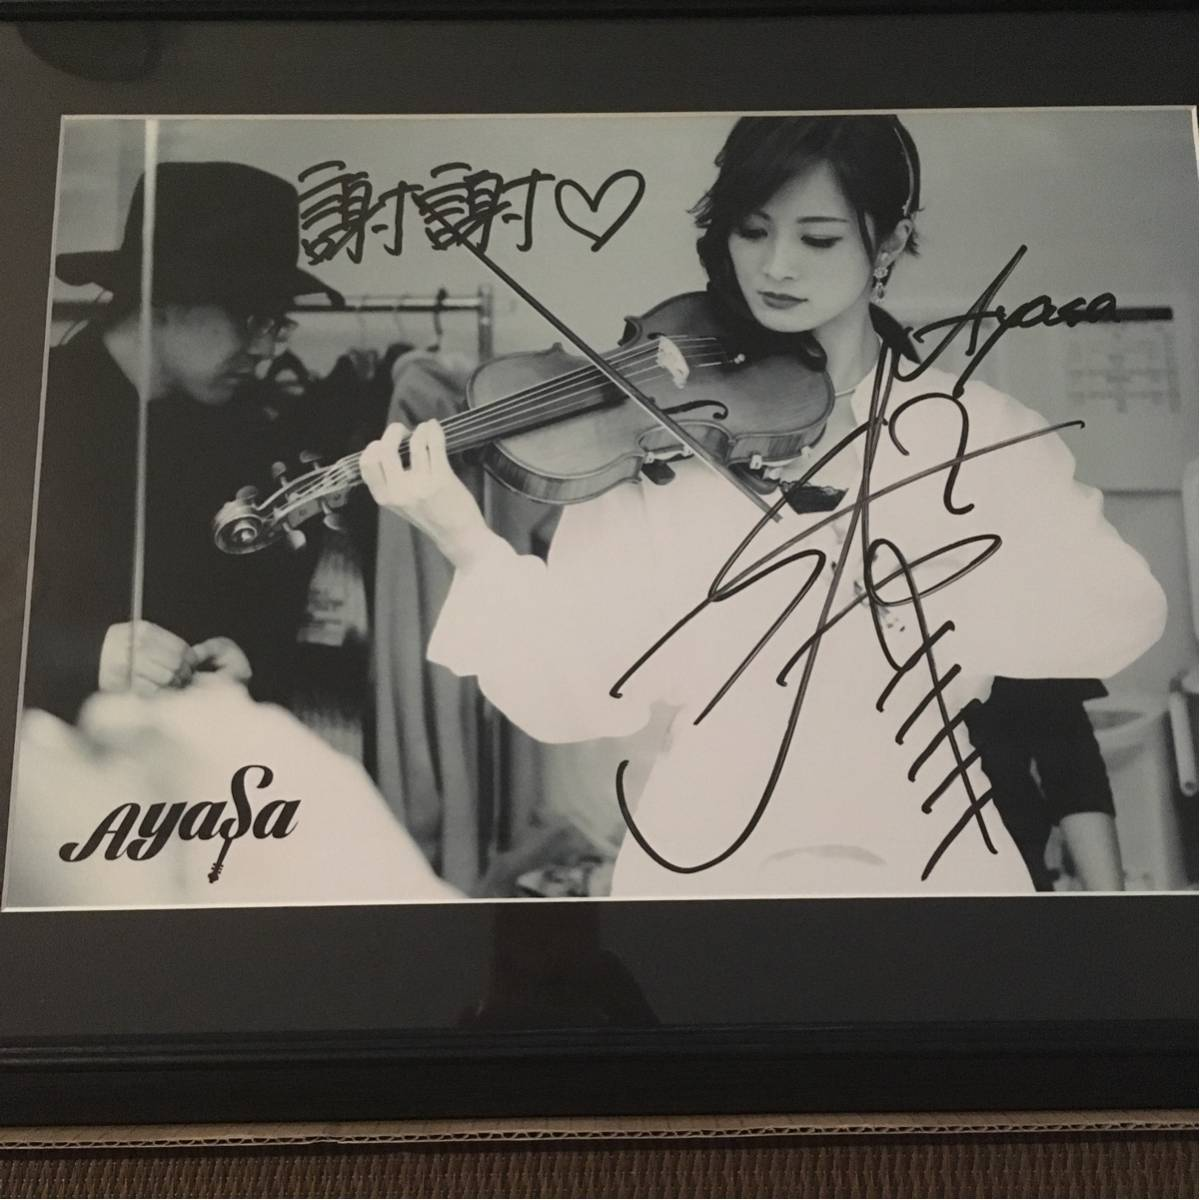 Ayasa 公式ライブフォト 直筆サイン入り 第2弾♯9